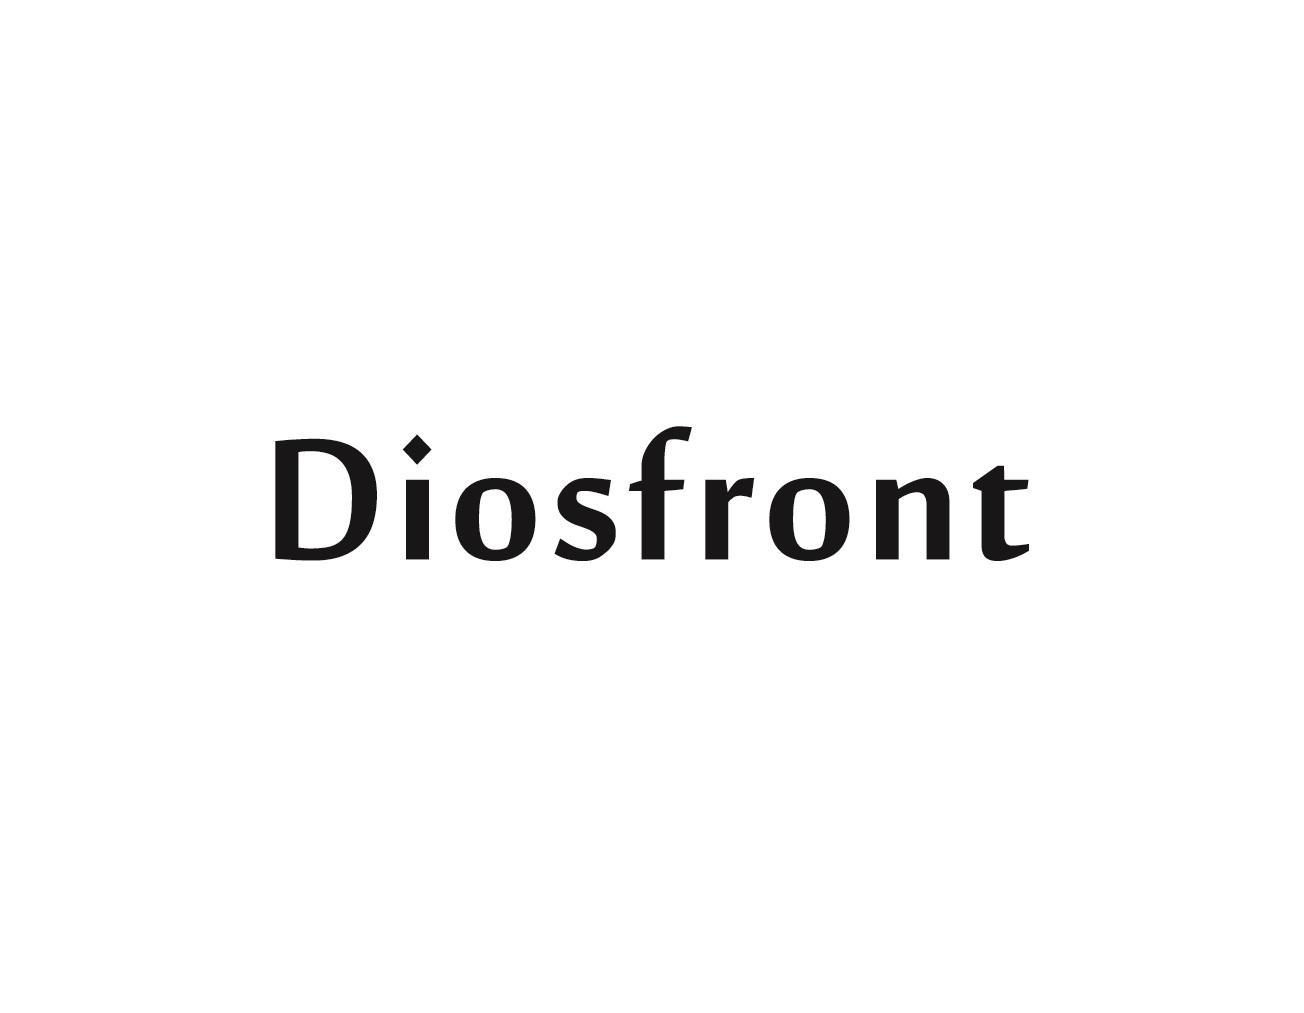 DIOSFRONT